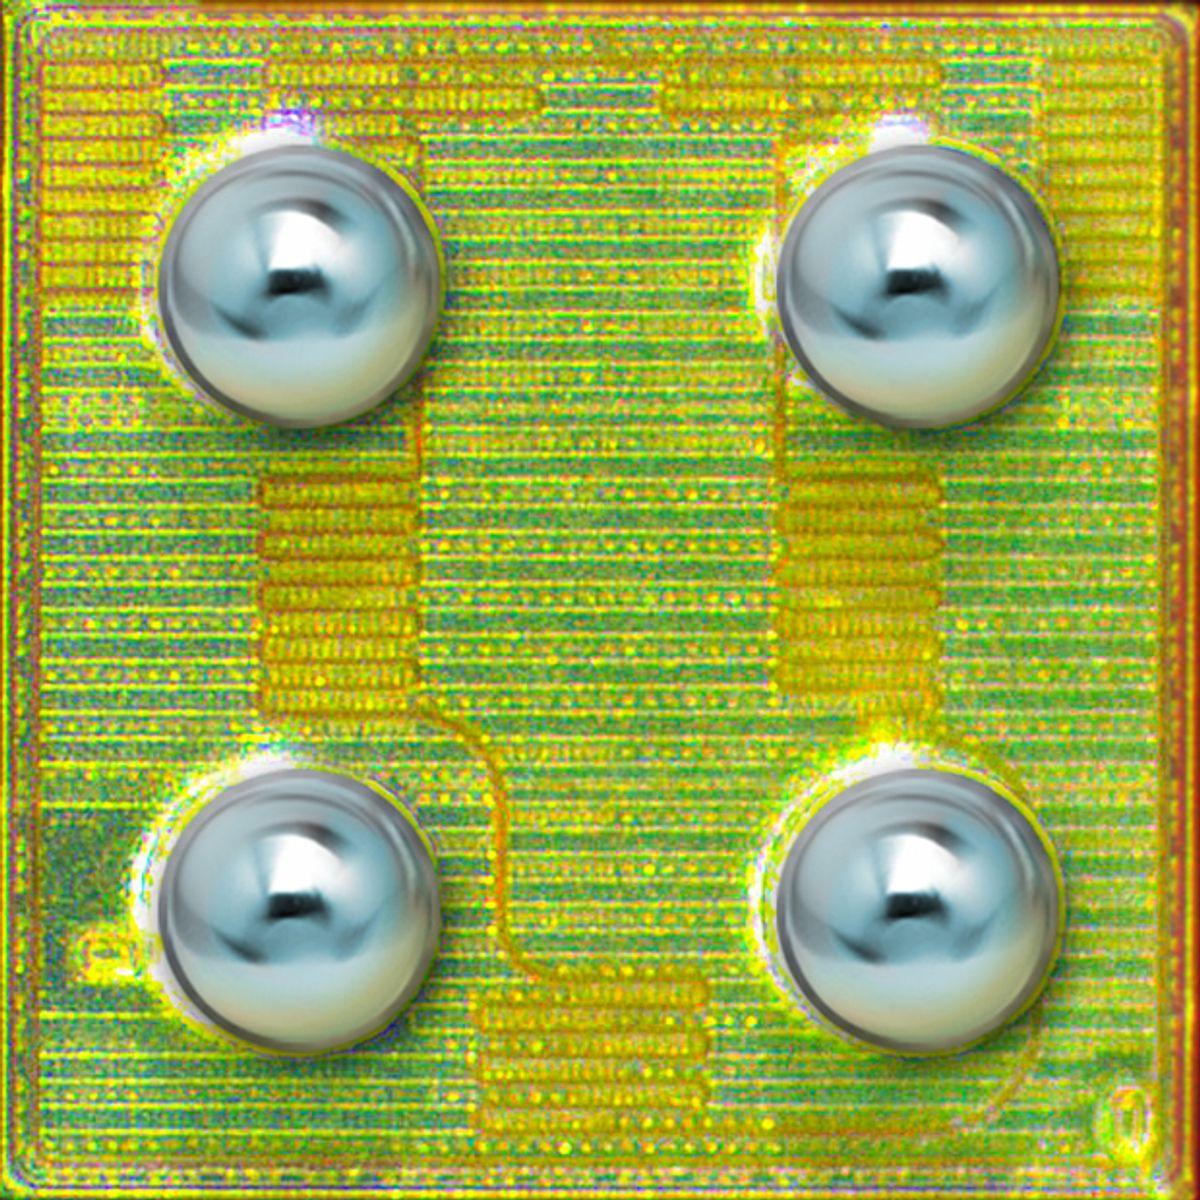 Gallium Nitride Power Transistors Priced Cheaper Than Silicon